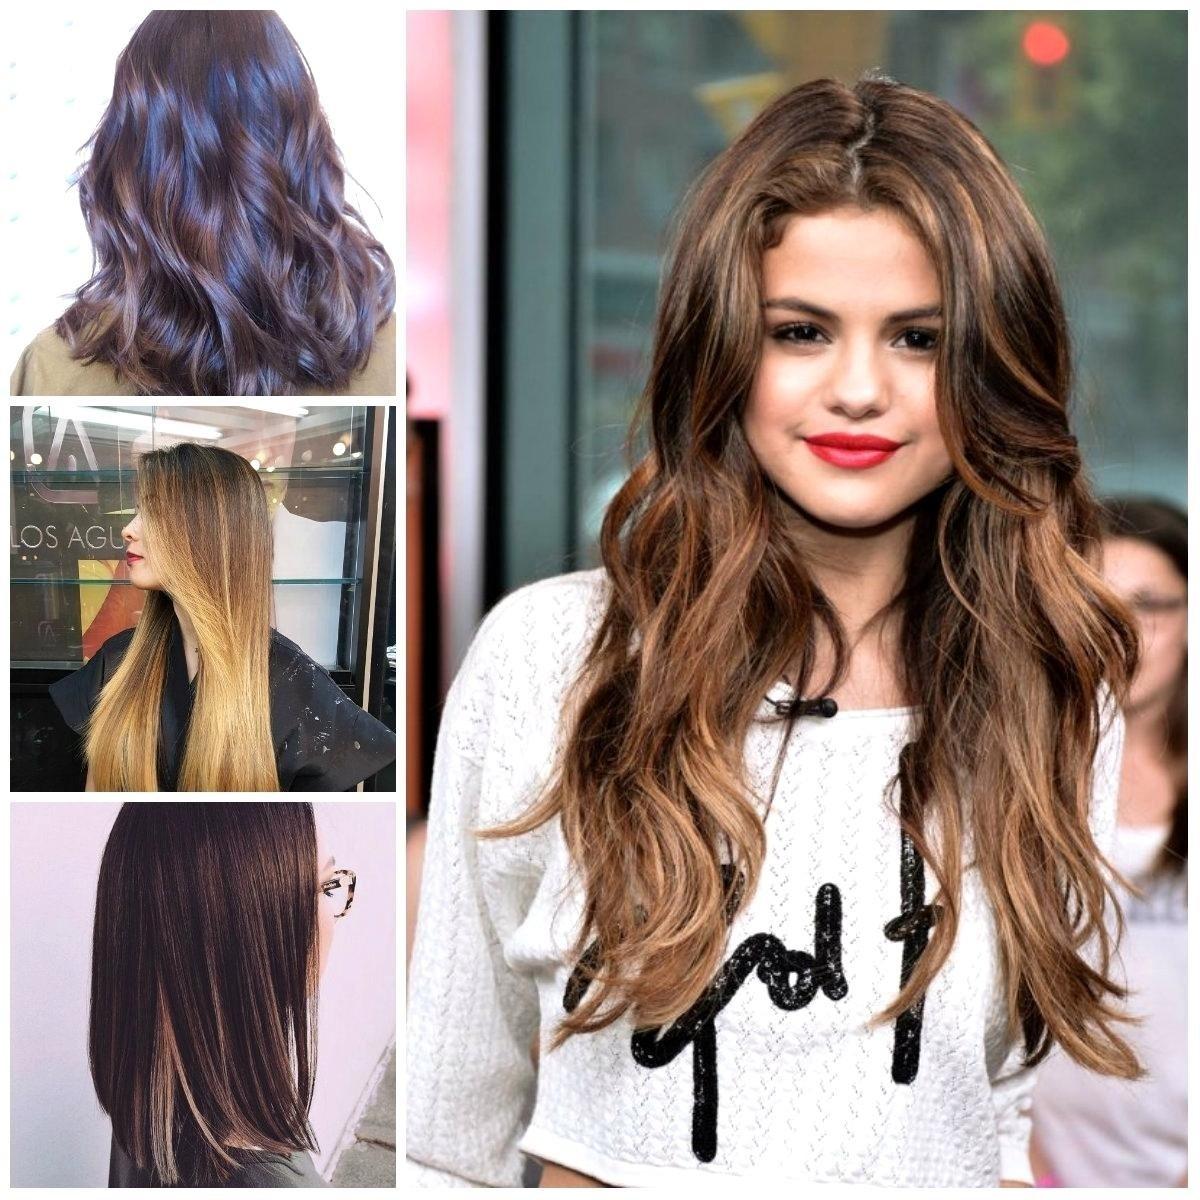 10 Famous Hair Dye Ideas For Dark Hair improbable color ideas dark brown light and dark brown hair color 1 2021